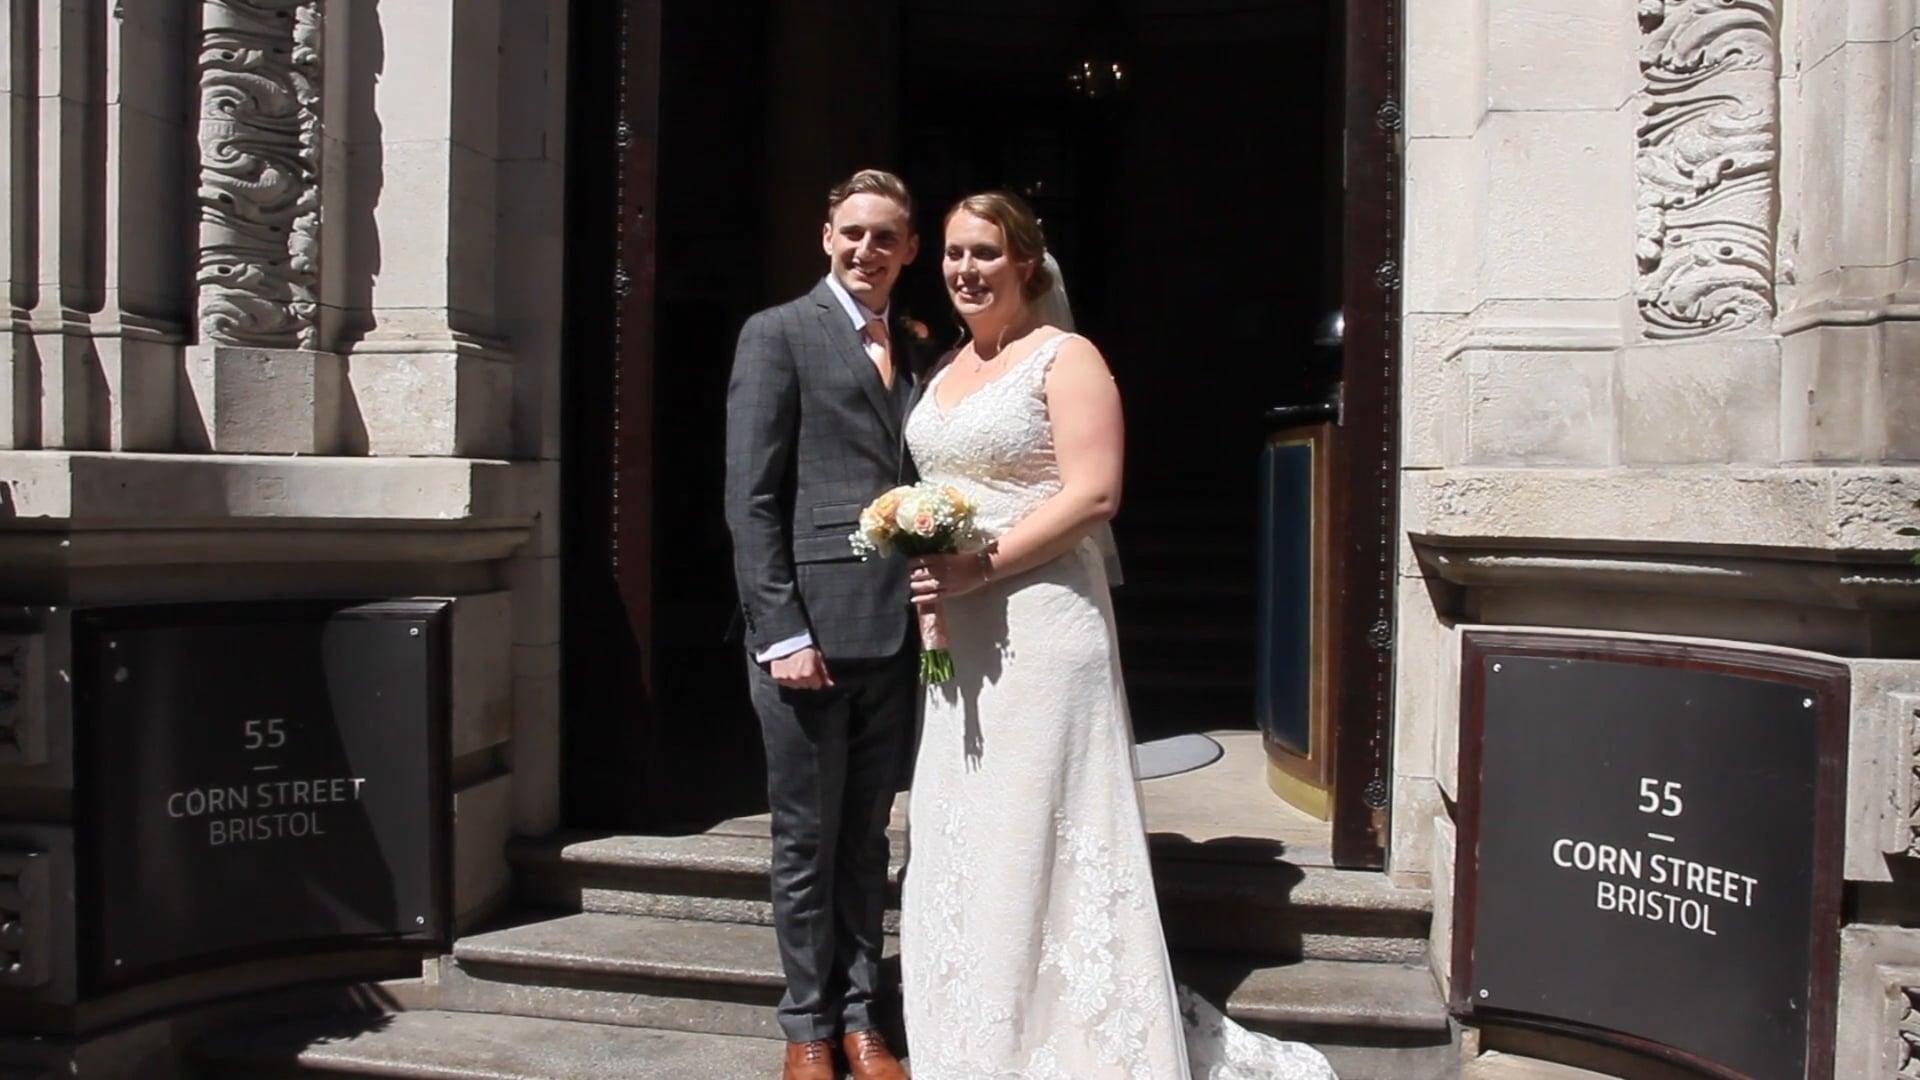 Chris & Amy's Wedding Highlights